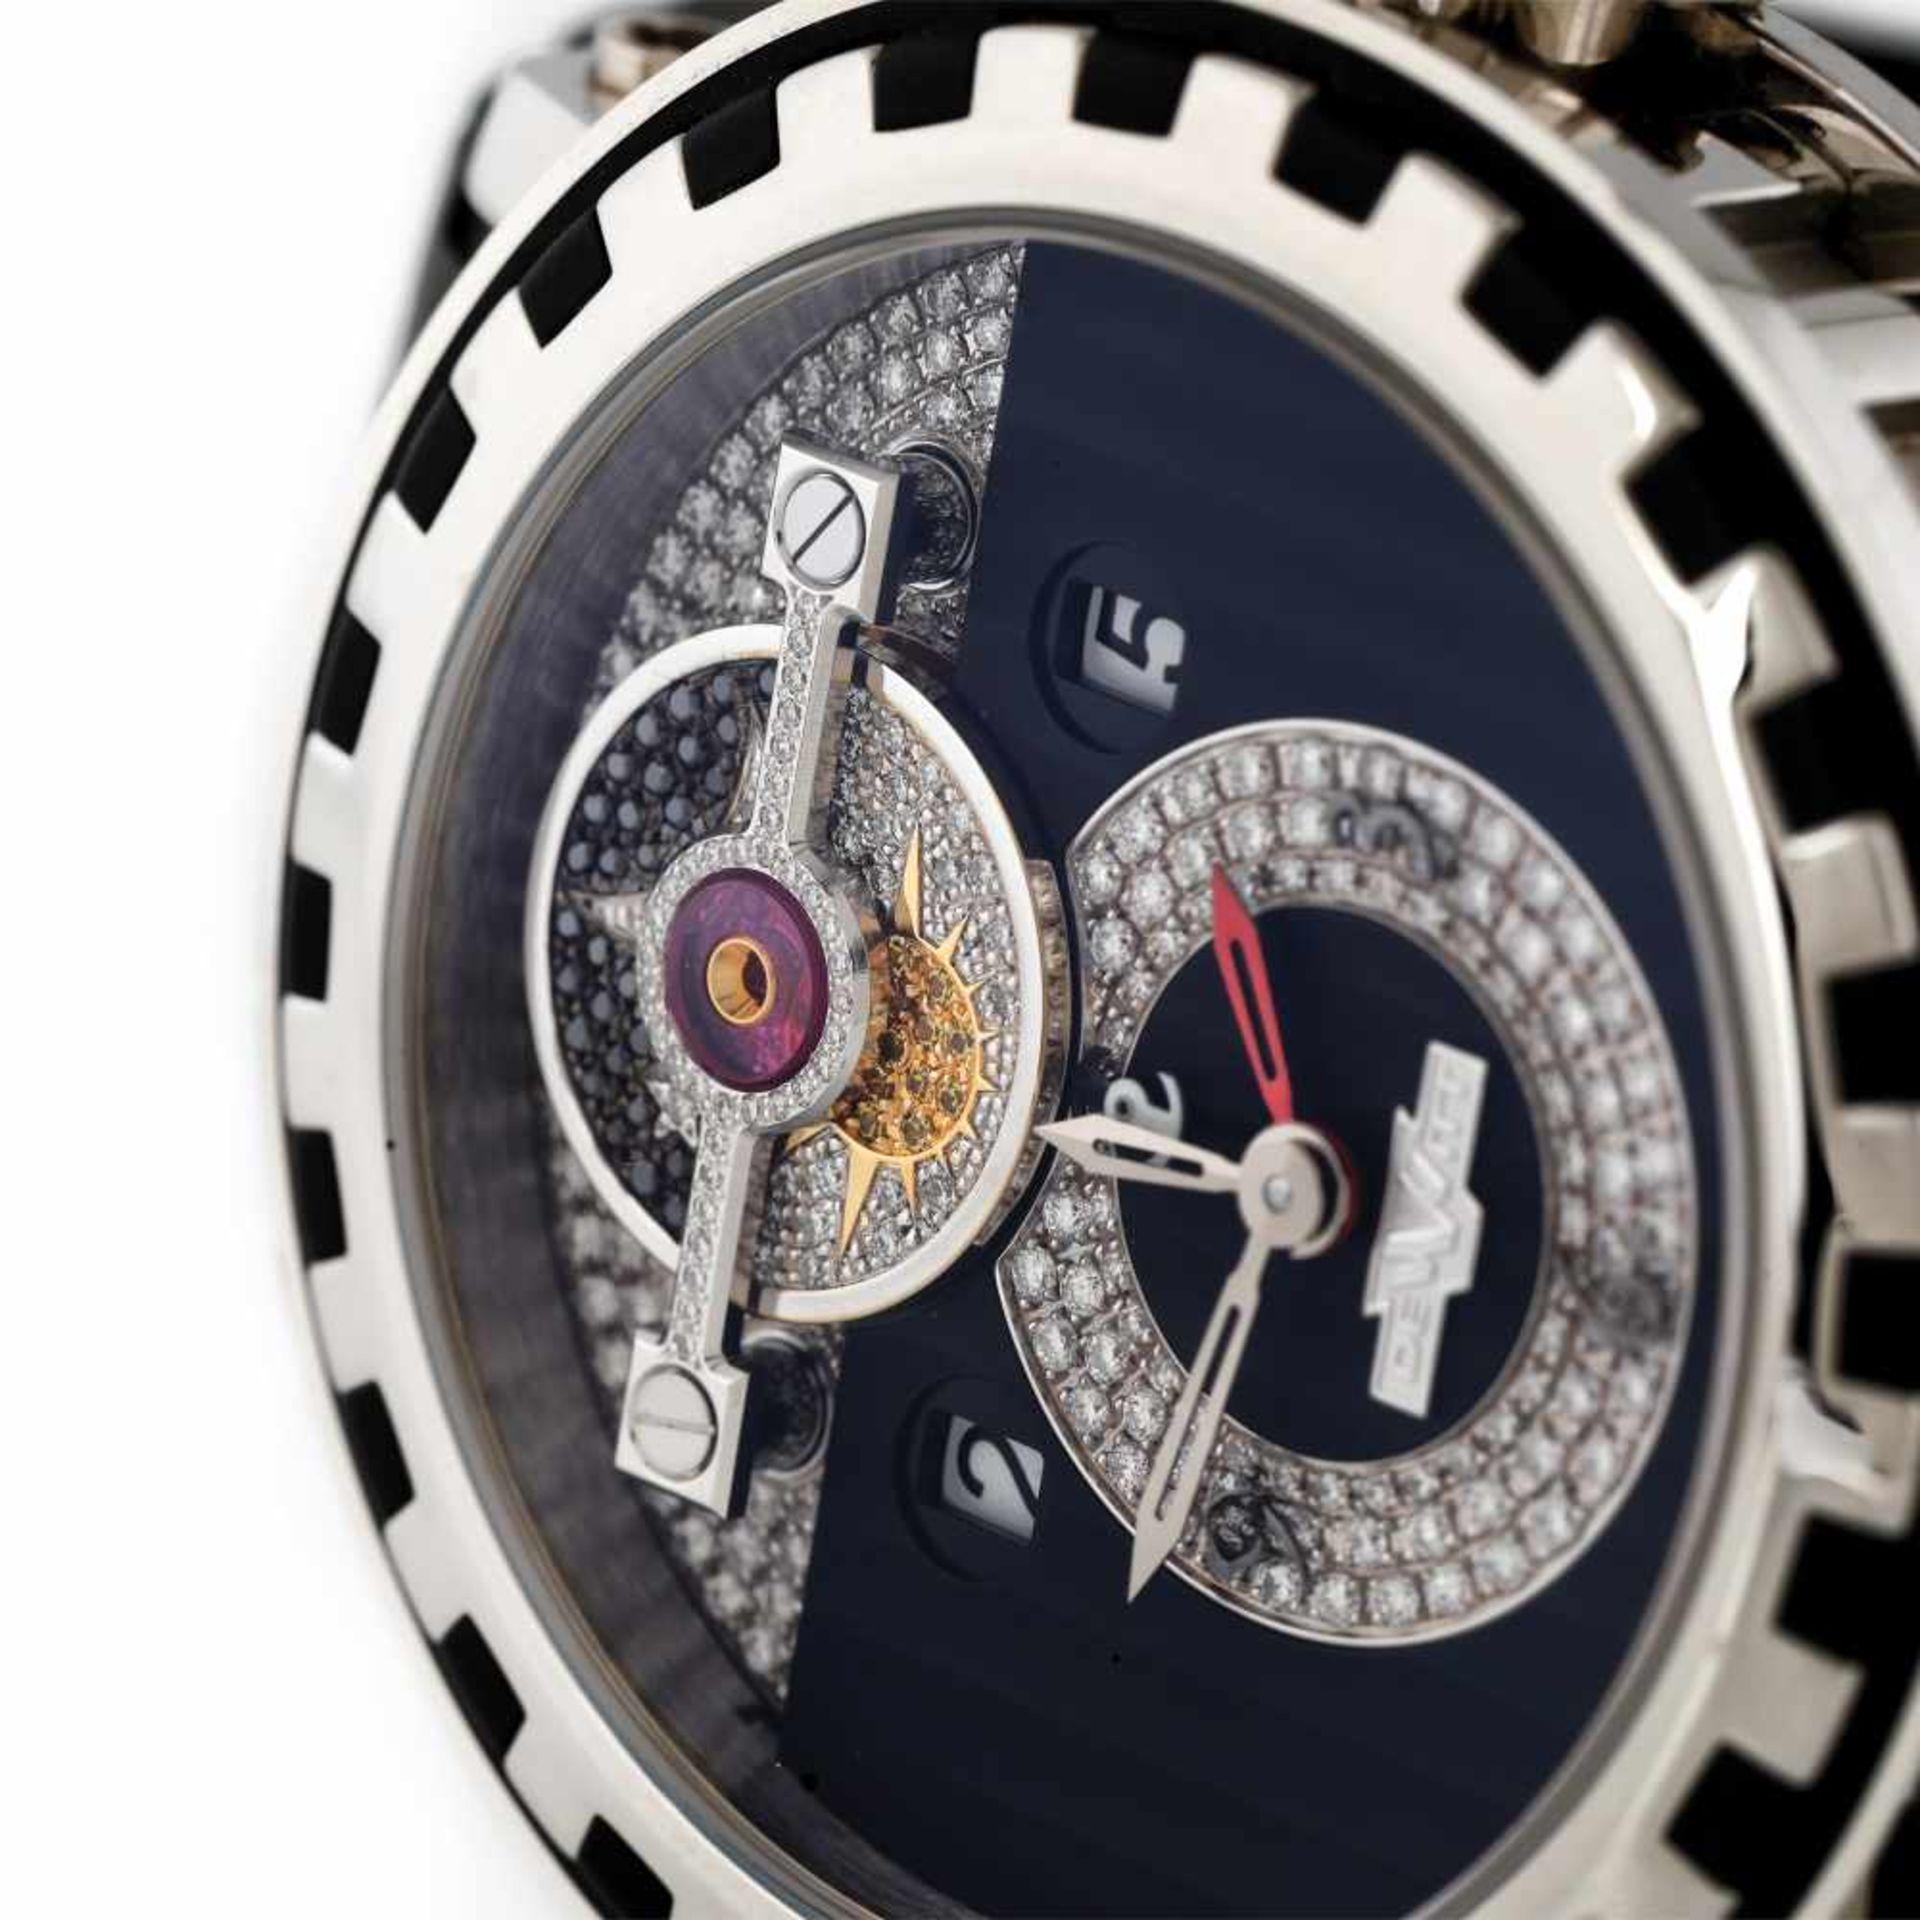 Dewitt Academia Triple Complication wristwatch, limited edition 11/250, provenance documents and ori - Bild 2 aus 4